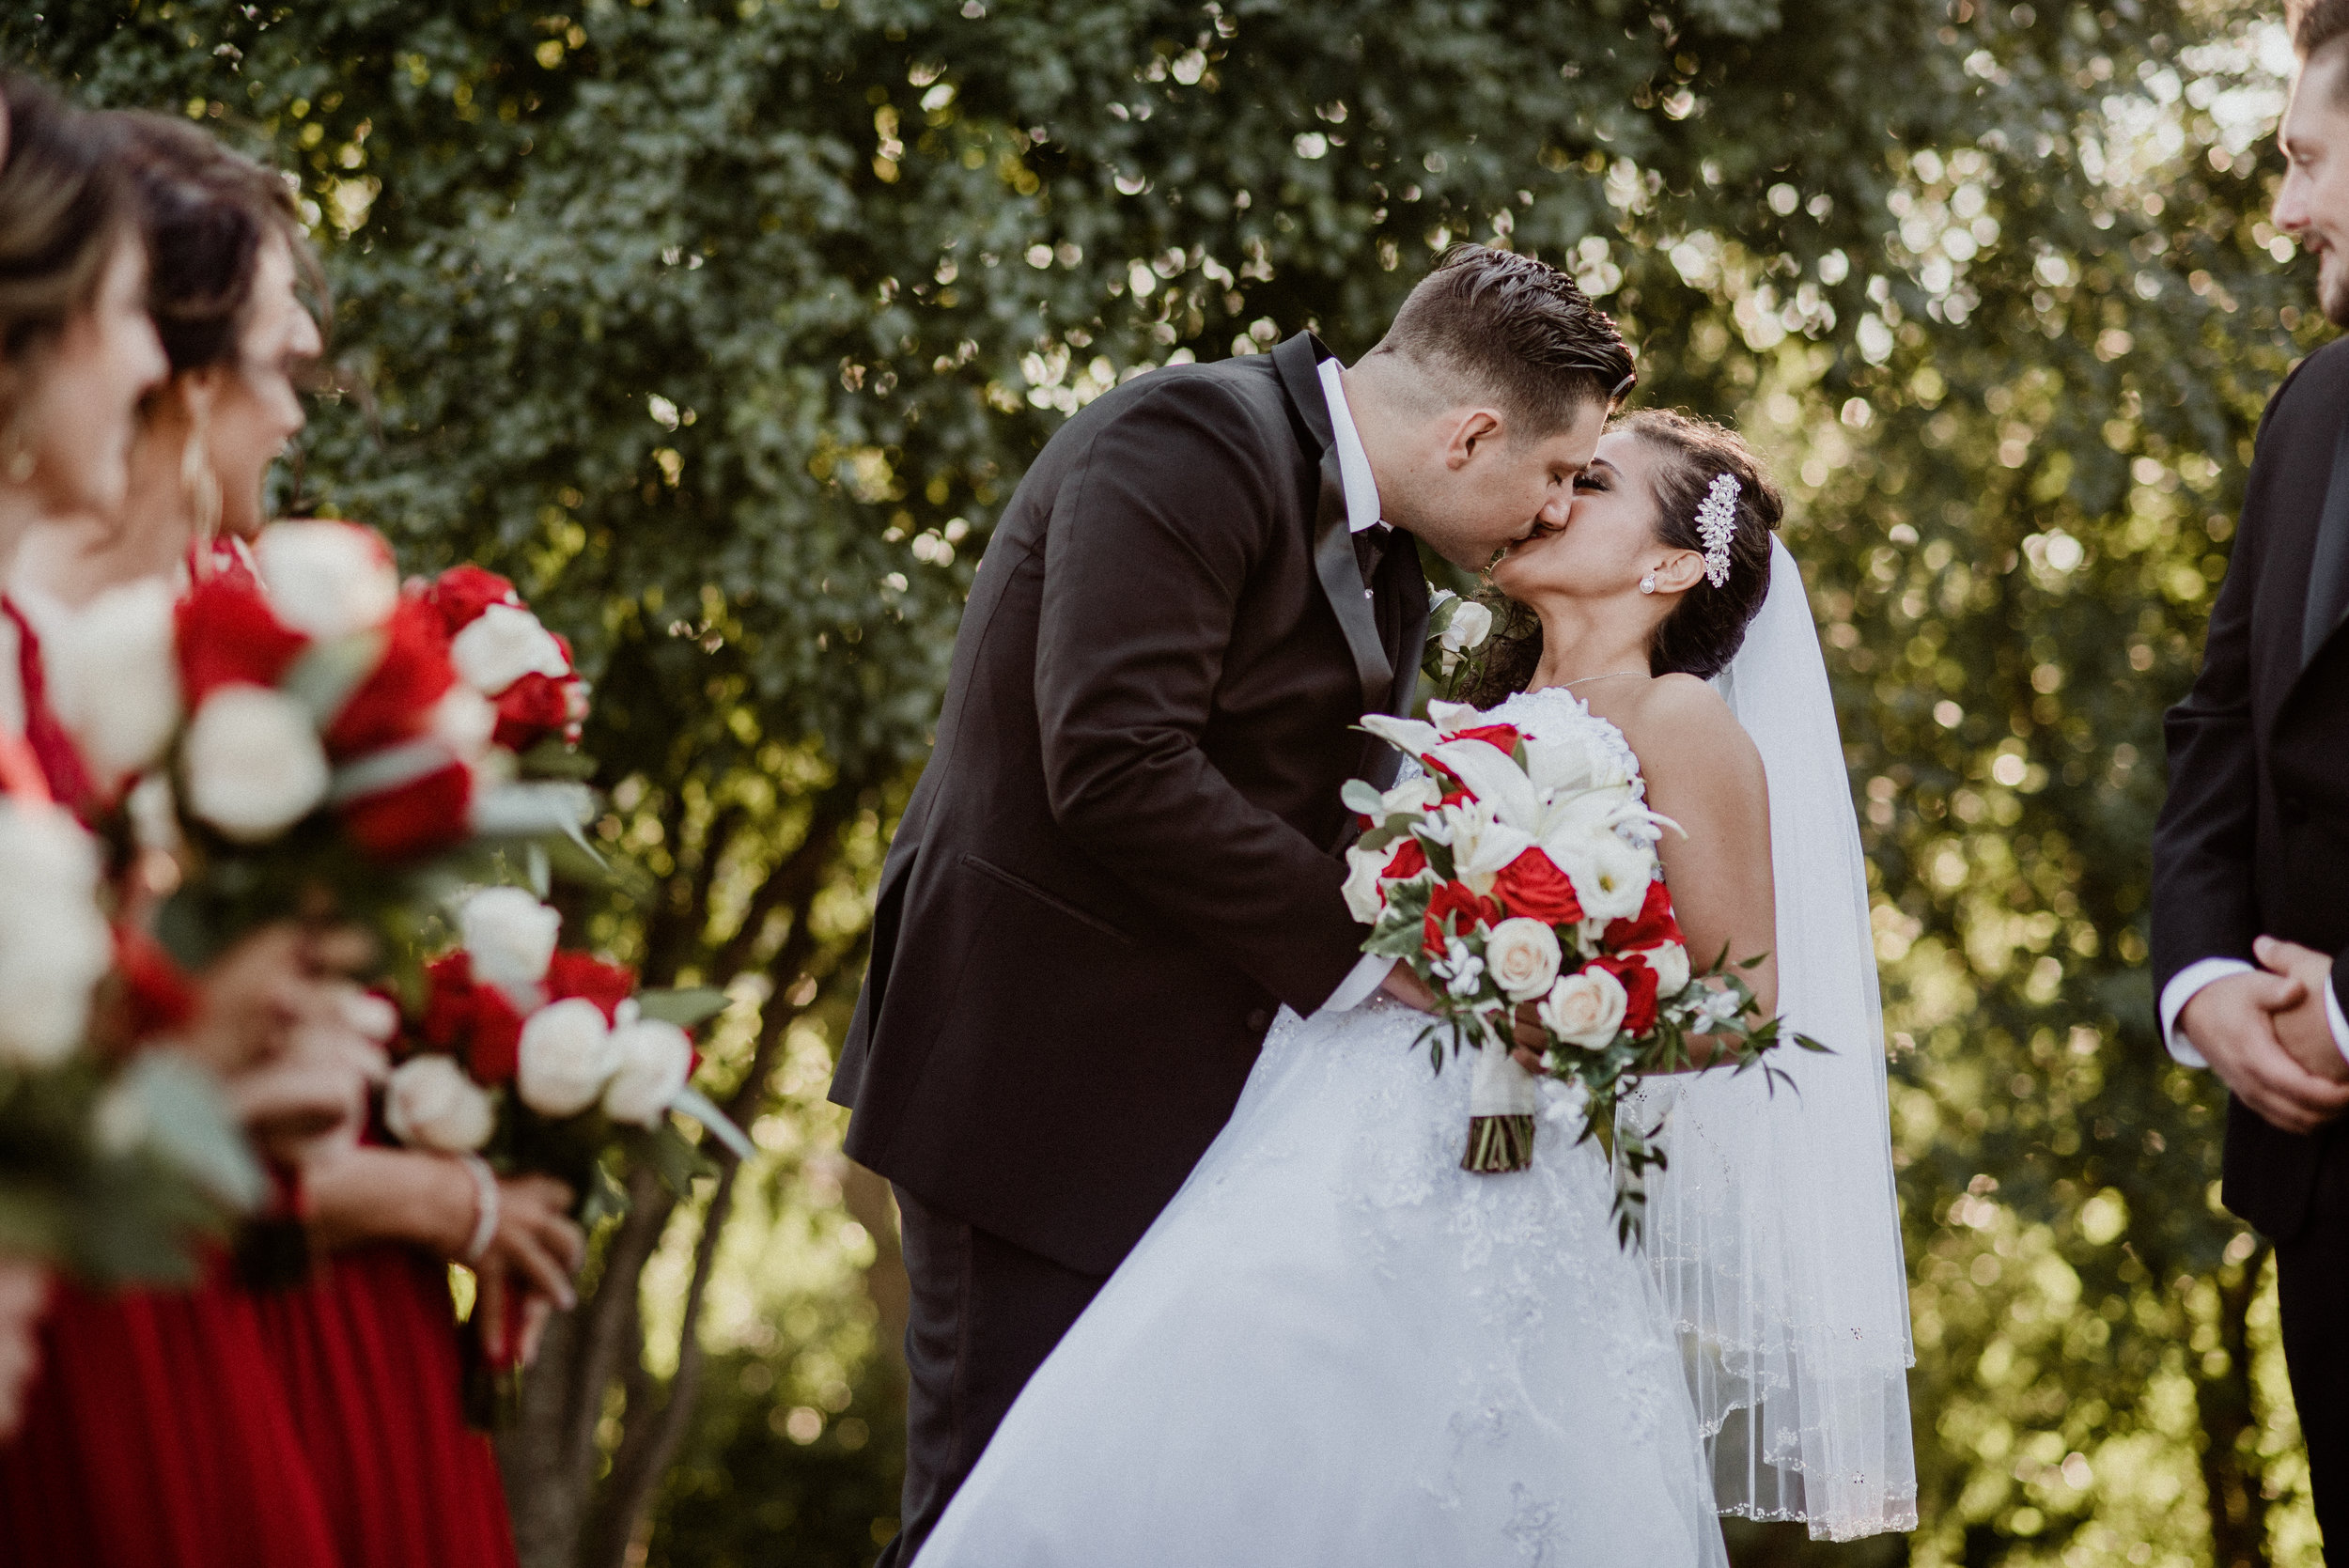 Rosalia and Pietro - Romantic Italian Wedding | St. Pascals Catholic Parish Ceremony | Alta Villa Banquets | Addison, IL